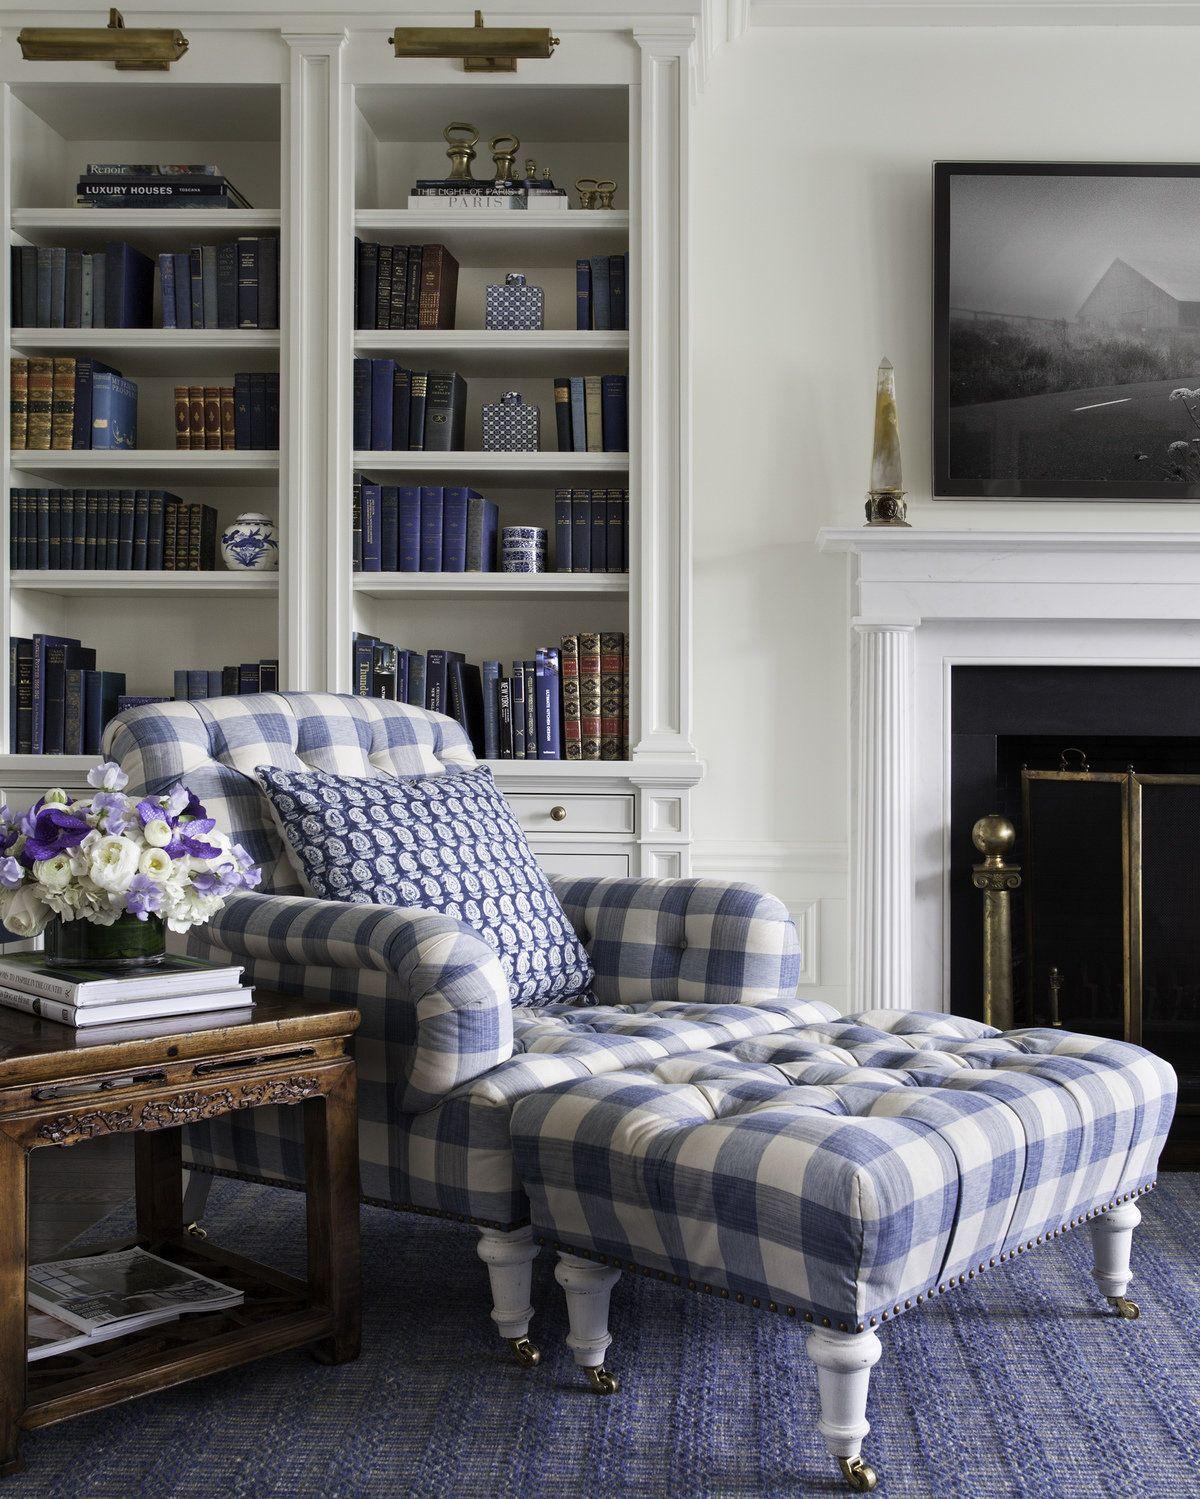 obelisk furniture. An Obelisk For The Mantle PieceAlexa Hampton Interiors Furniture